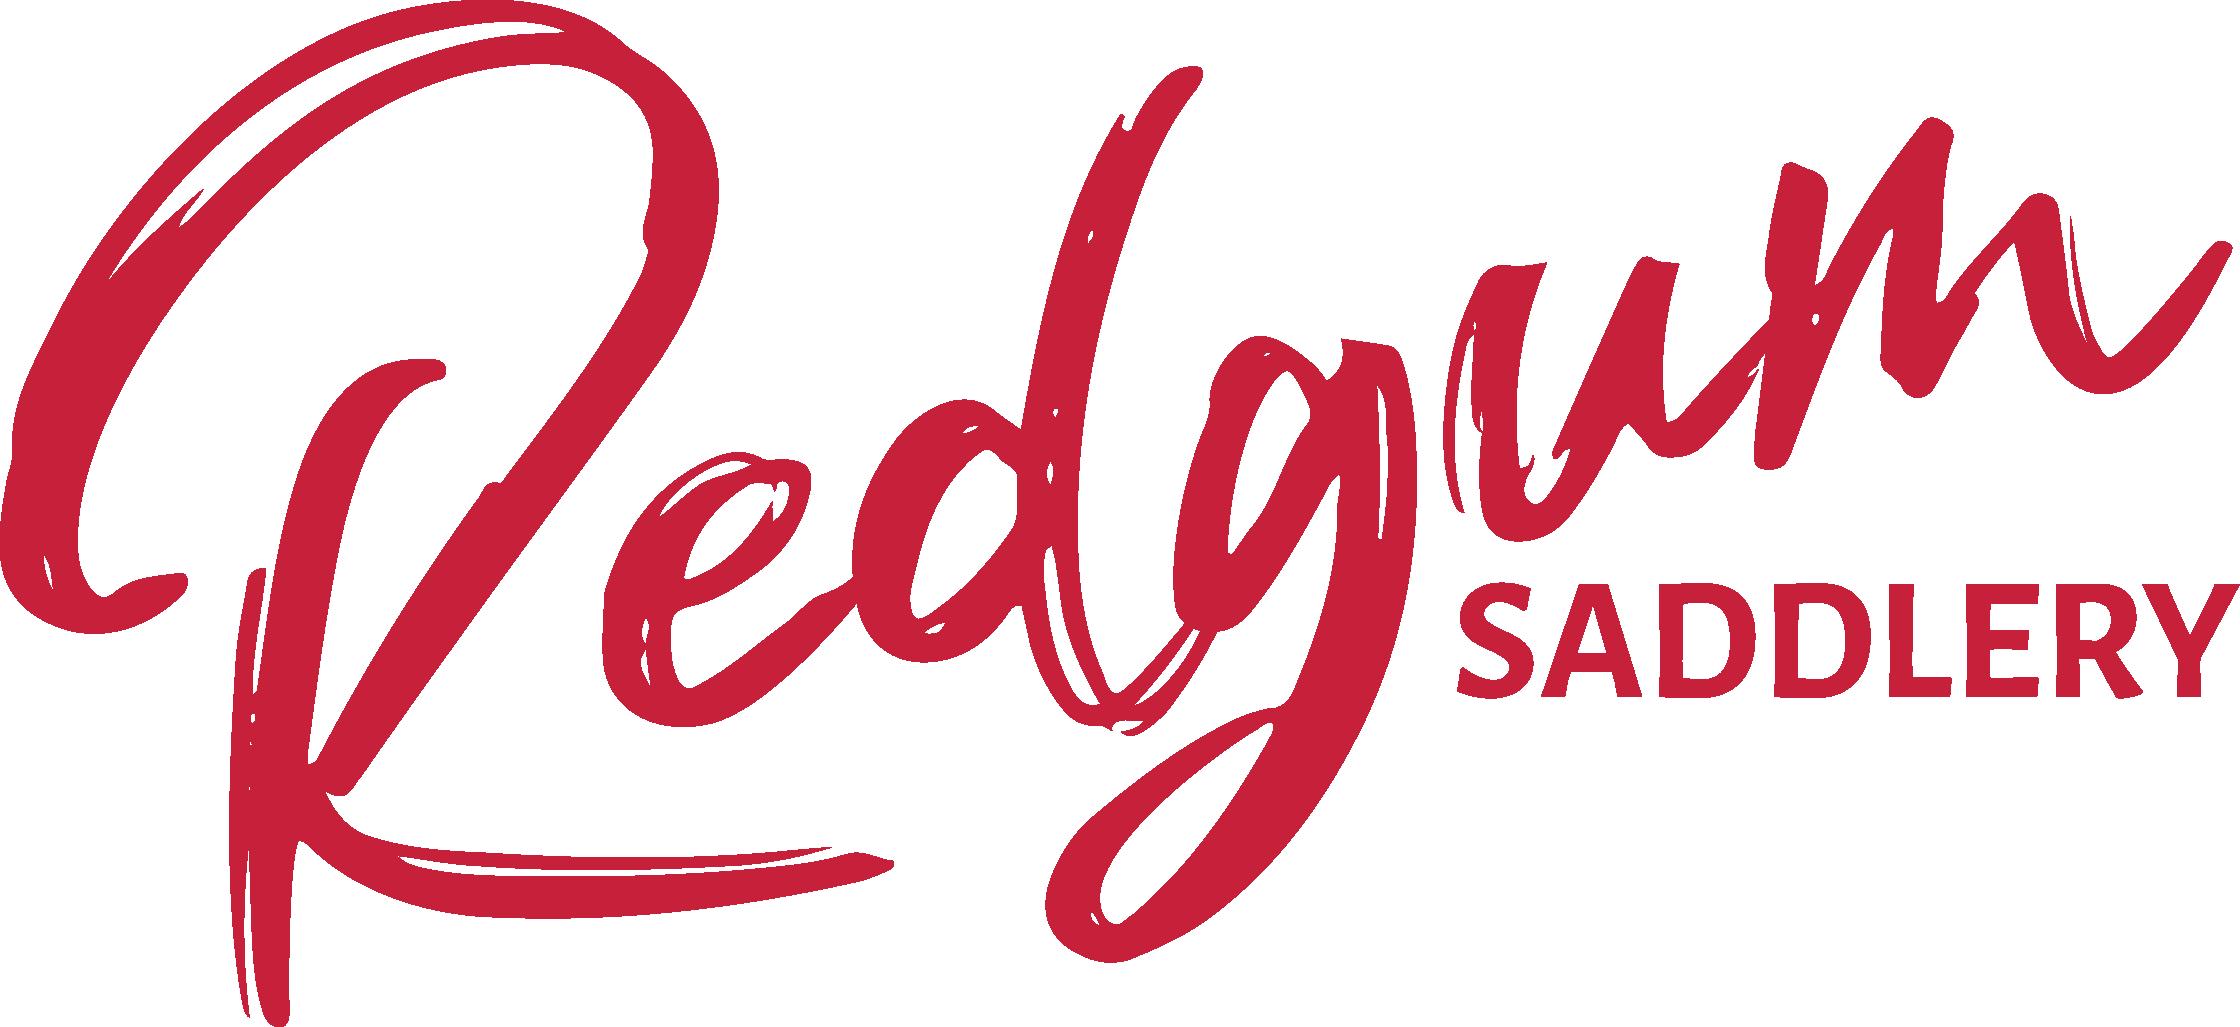 Redgum Saddlery